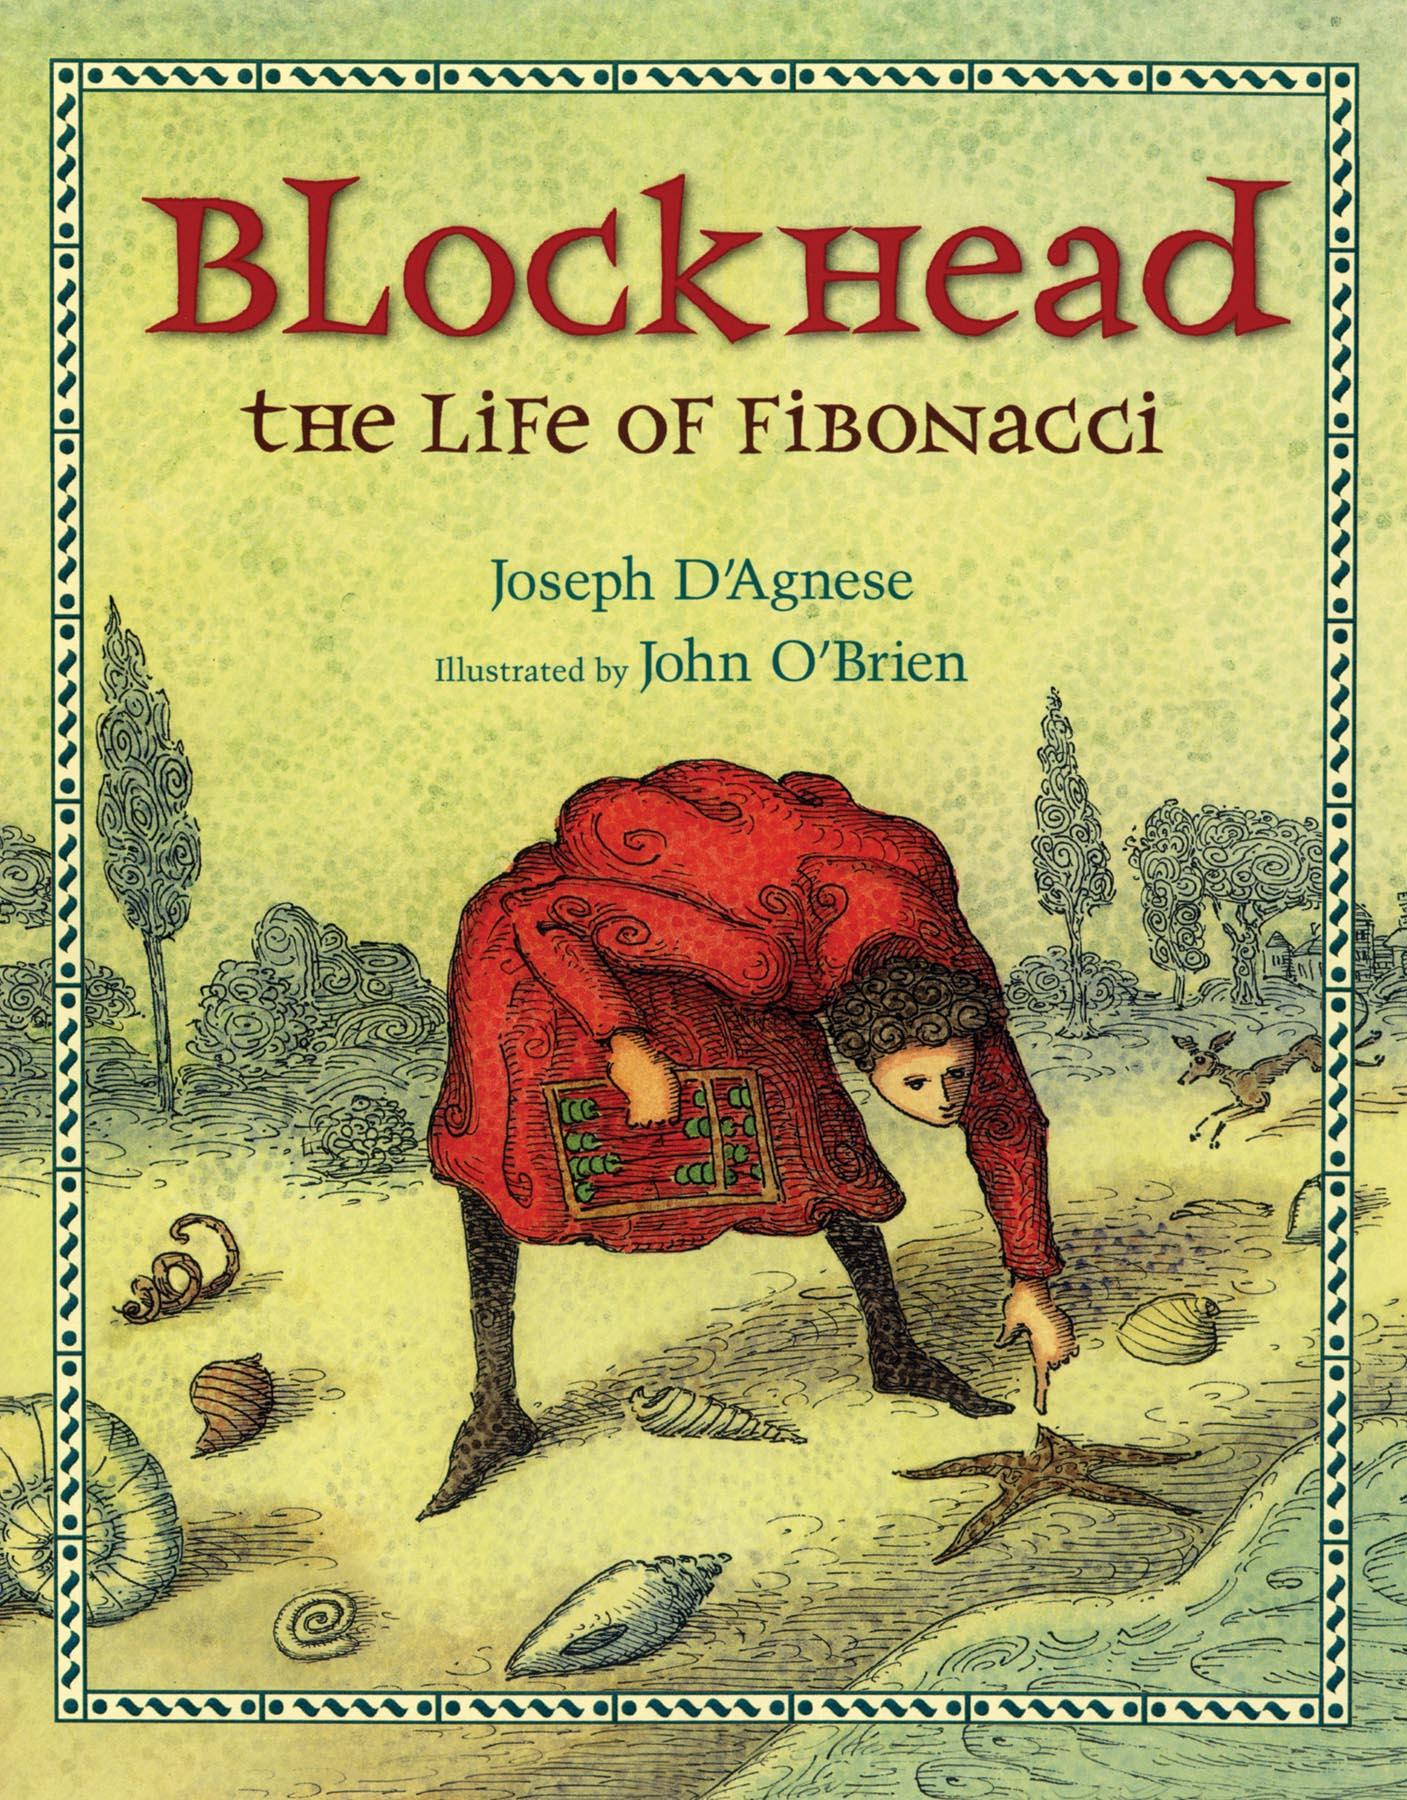 Blockhead: The Life of Fibonacci by Joseph D'Agnese